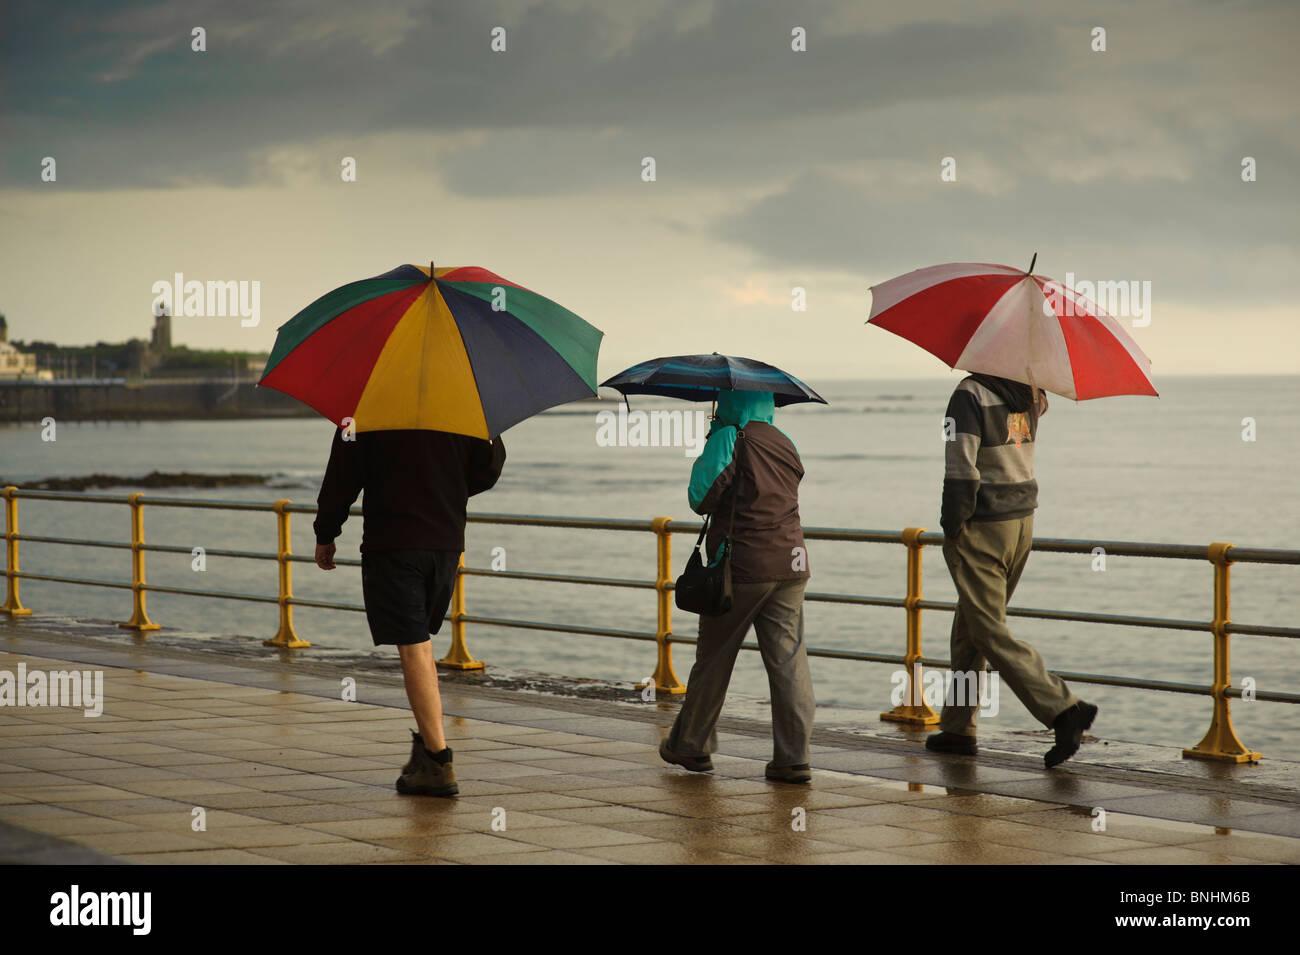 Three people sheltering under umbrellas on a wet summer evening, Aberystwyth Wales UK - Stock Image